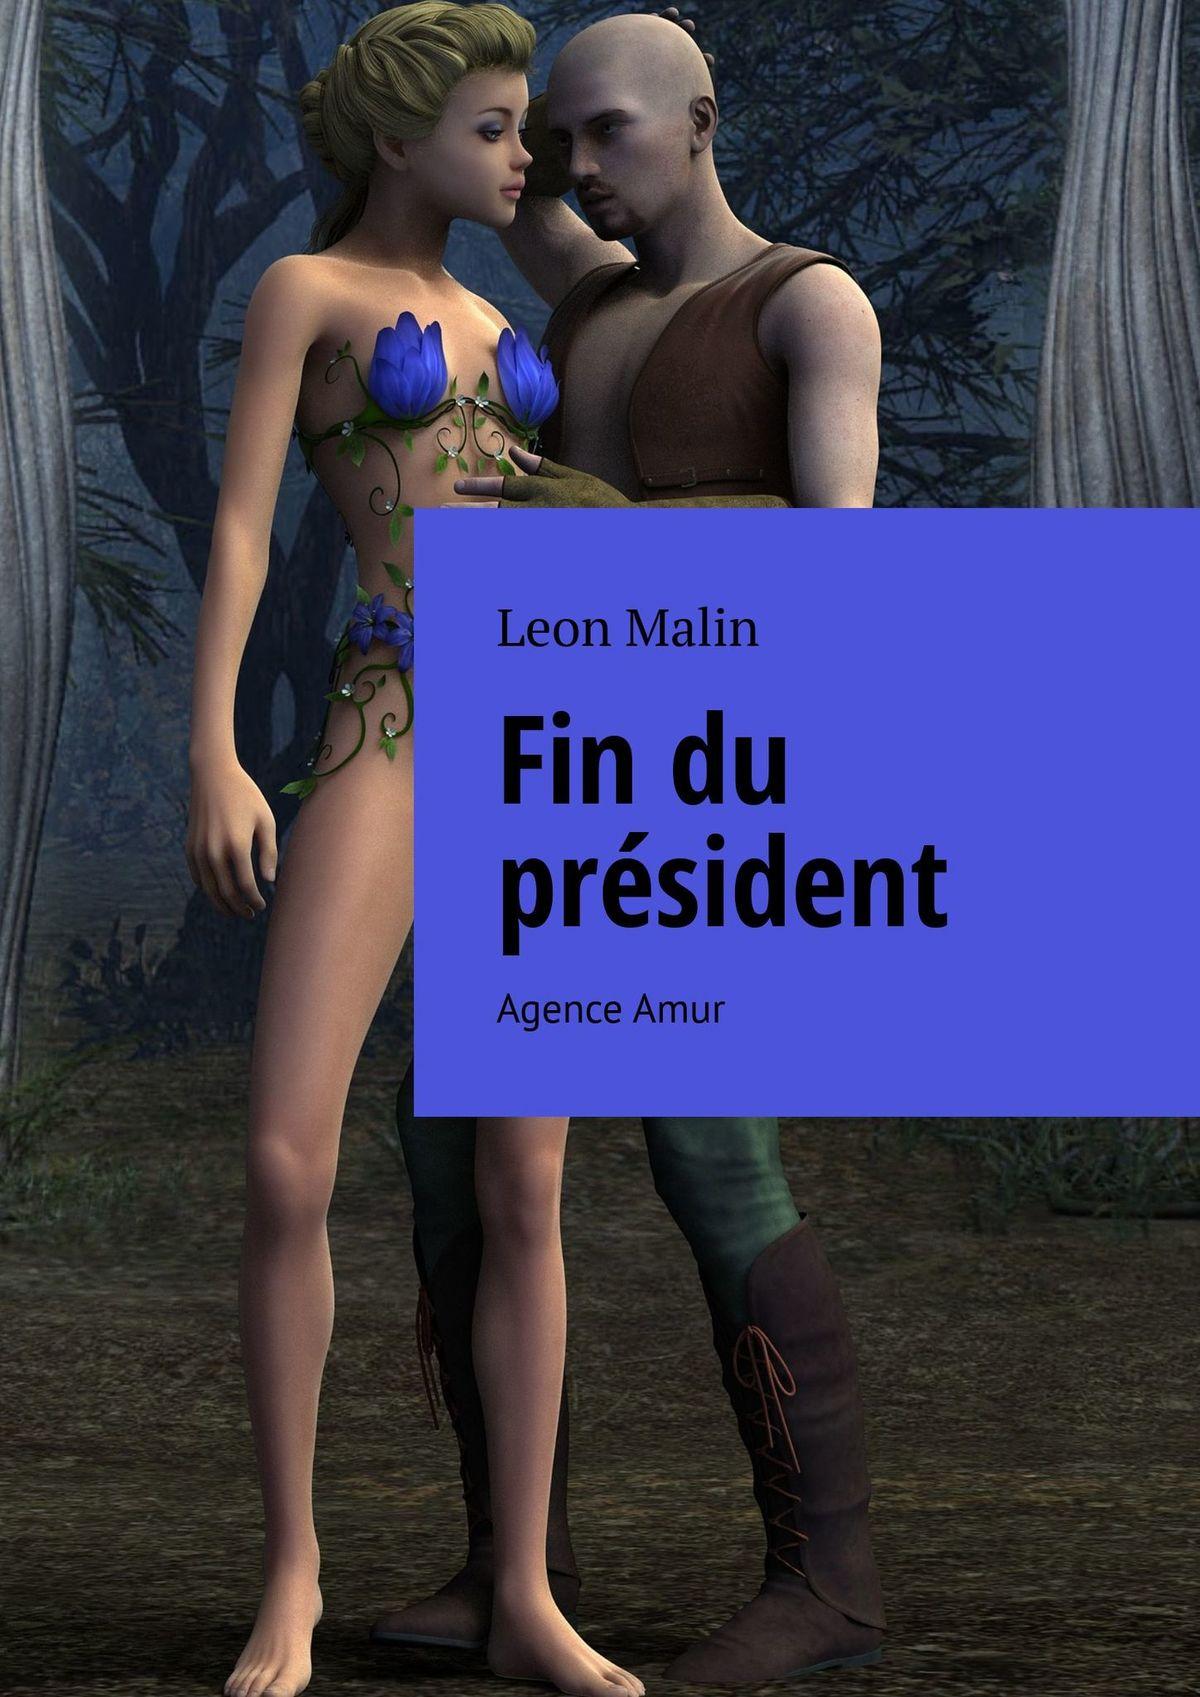 Leon Malin Fin du président. Agence Amur vitaly mushkin porn sexe en ligne